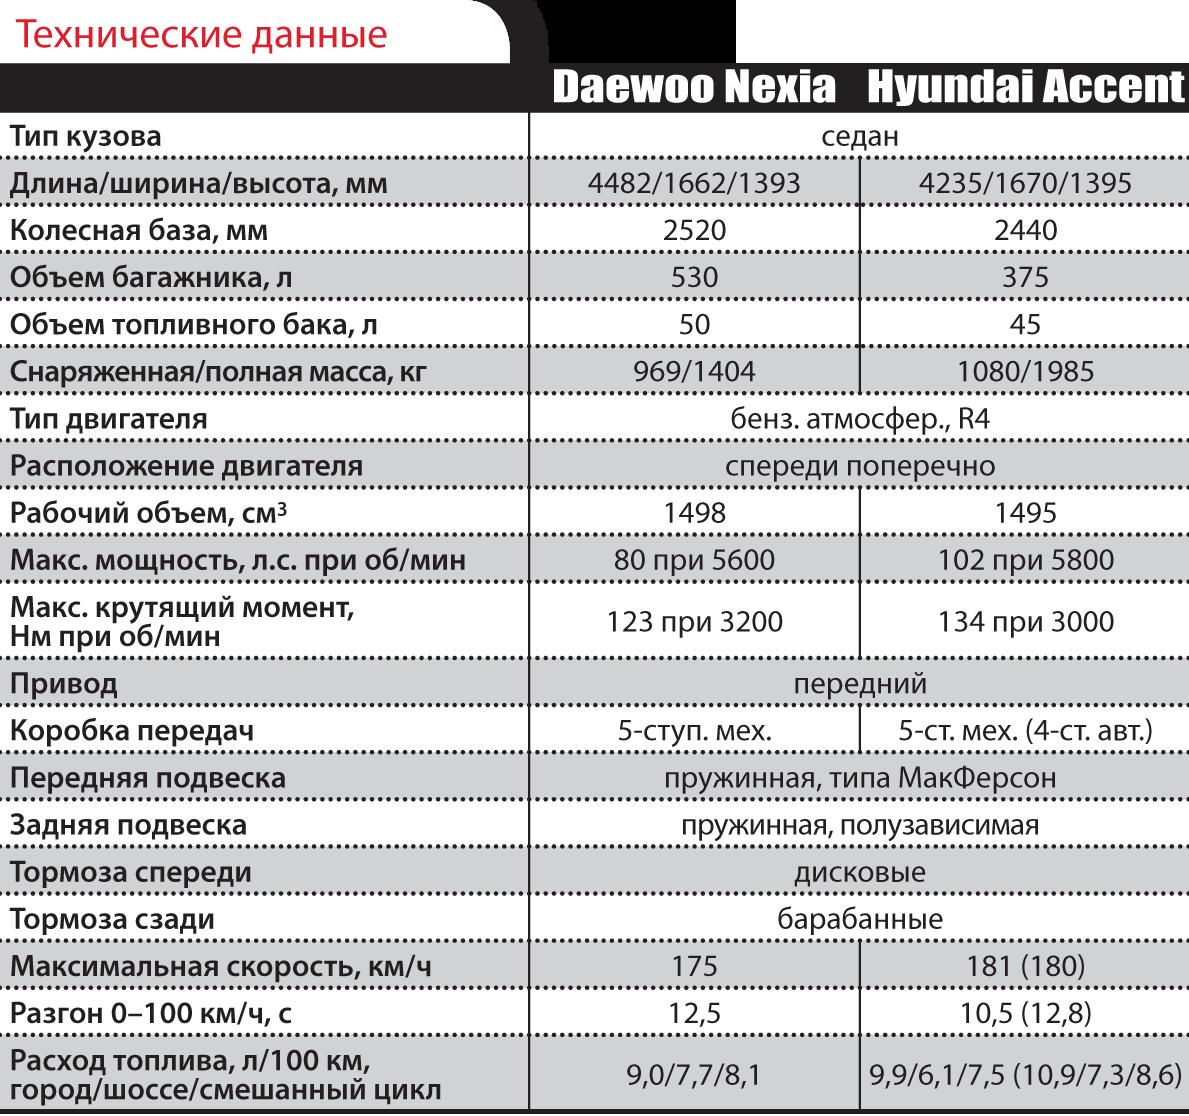 Hyundai Accent иDaewoo Nexia